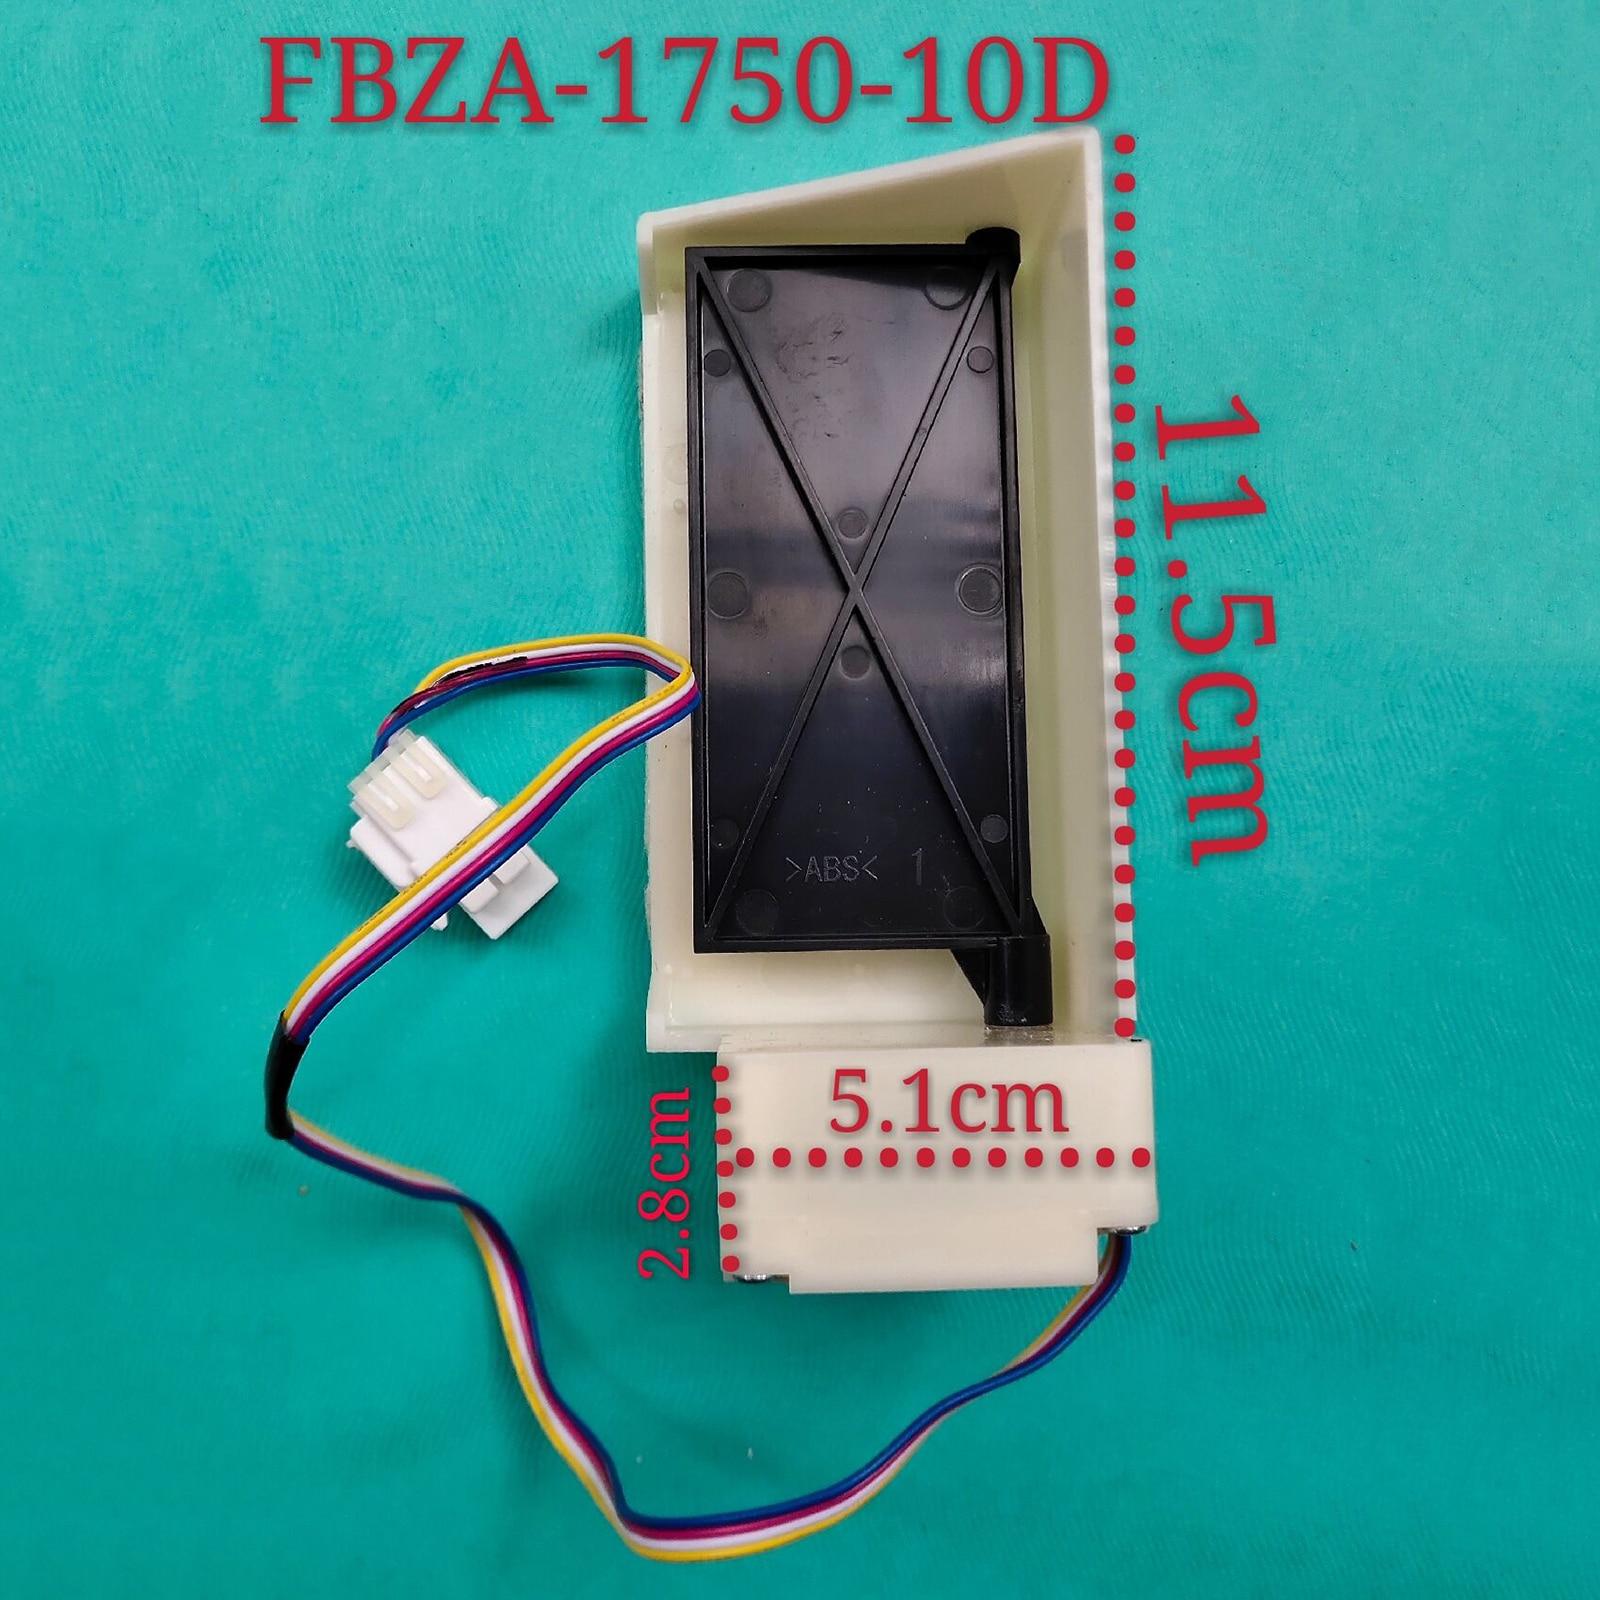 FBZA-1750-10D Refrigerator Freezer Damper Motor for Samsung DA31-00043F BCD-286WNQISS1 290WNRISA1 WNSIWW Refrigerator Parts